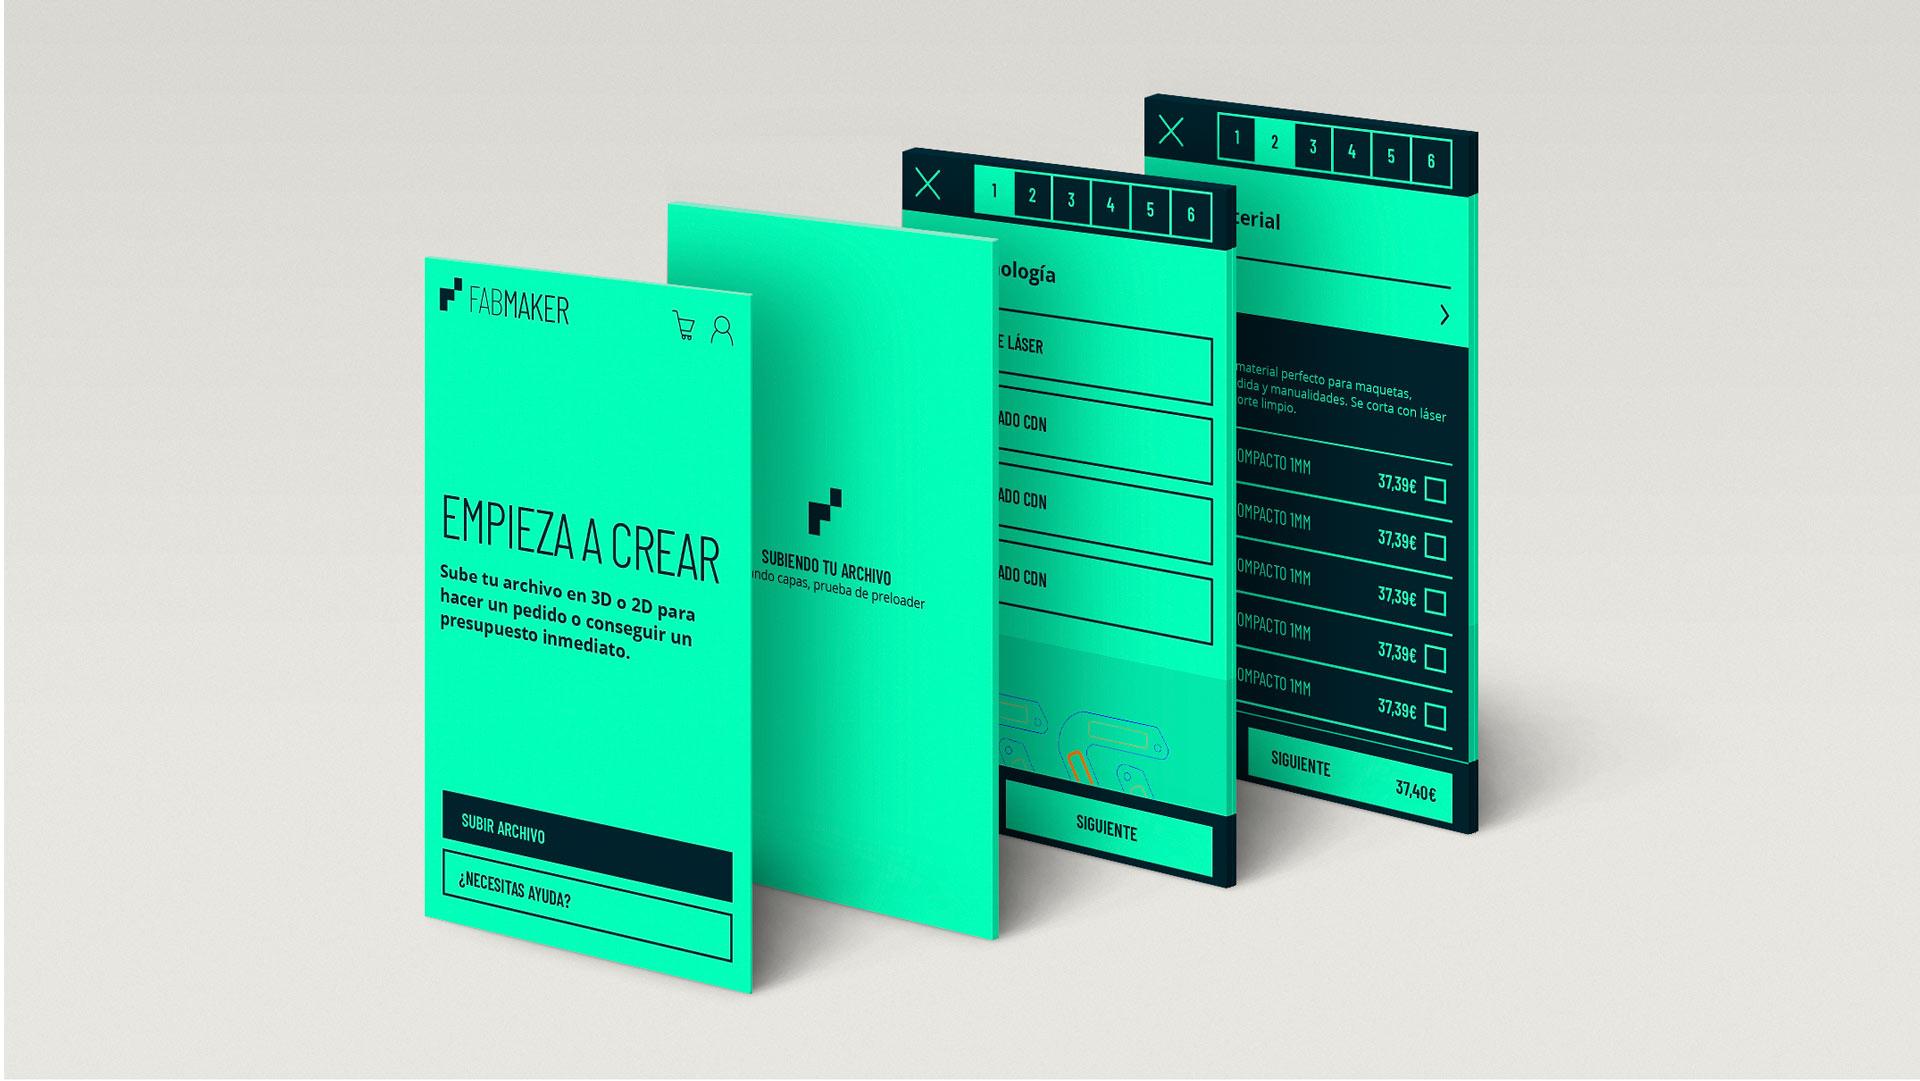 Mobile application design for Fabmaker